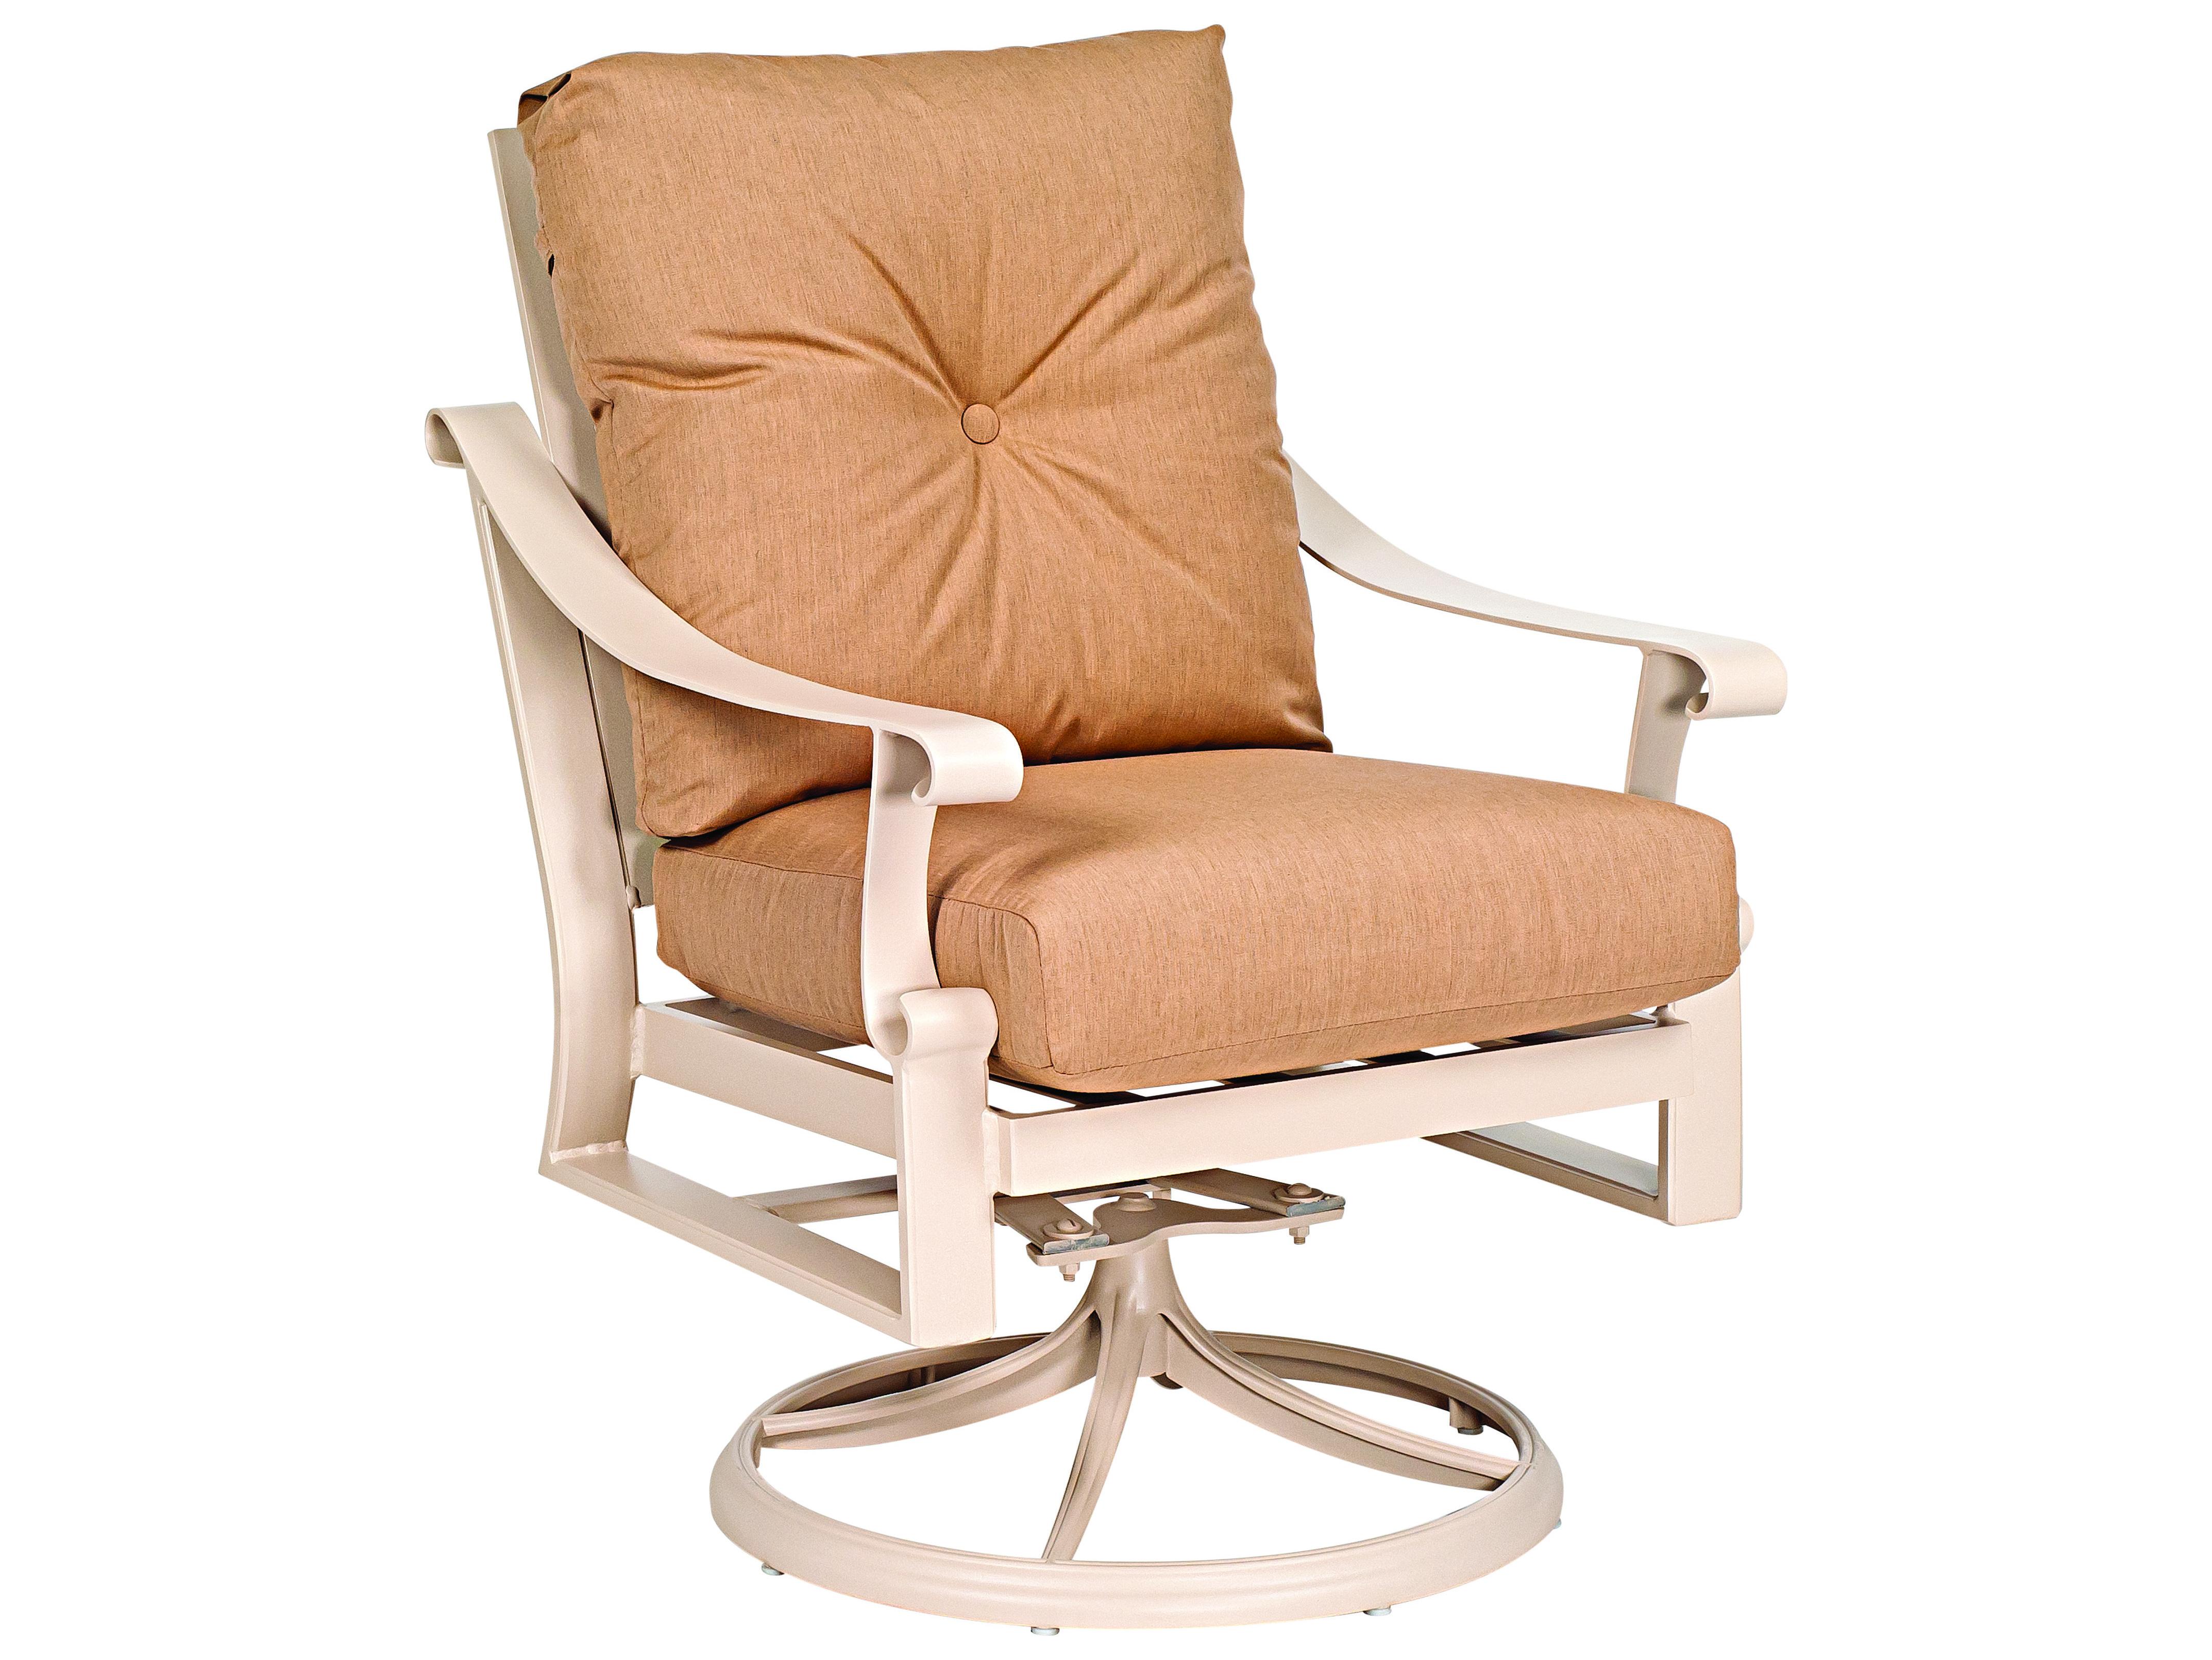 Woodard Bungalow Swivel Rocker Lounge Chair Replacement